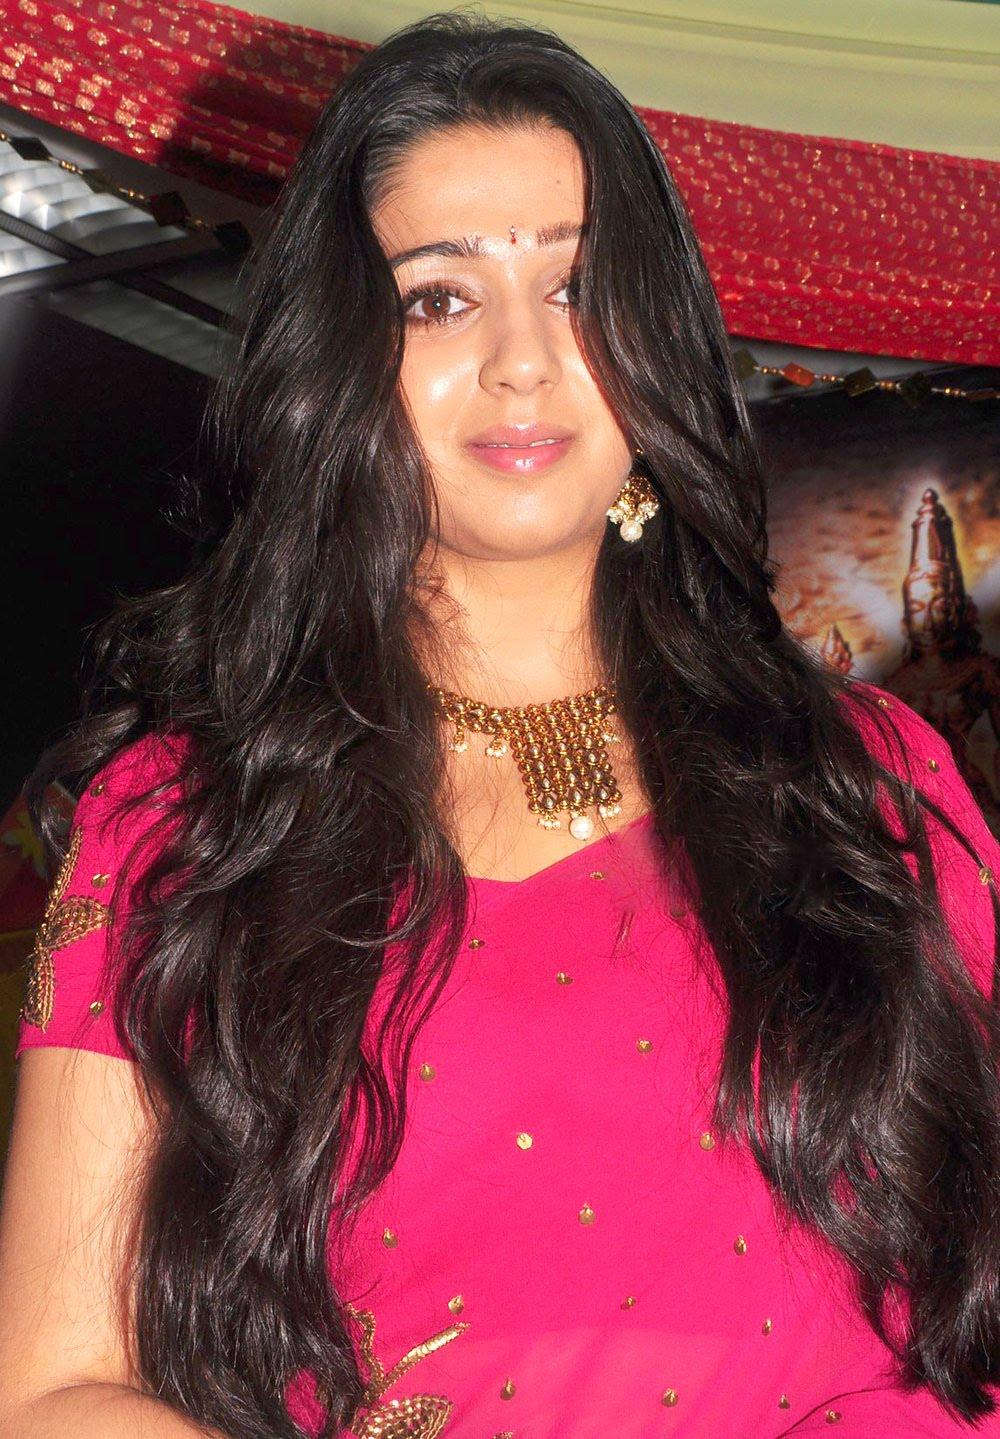 Bollywood Images Actress Charmi Kaur Hot Wallpapers -8631